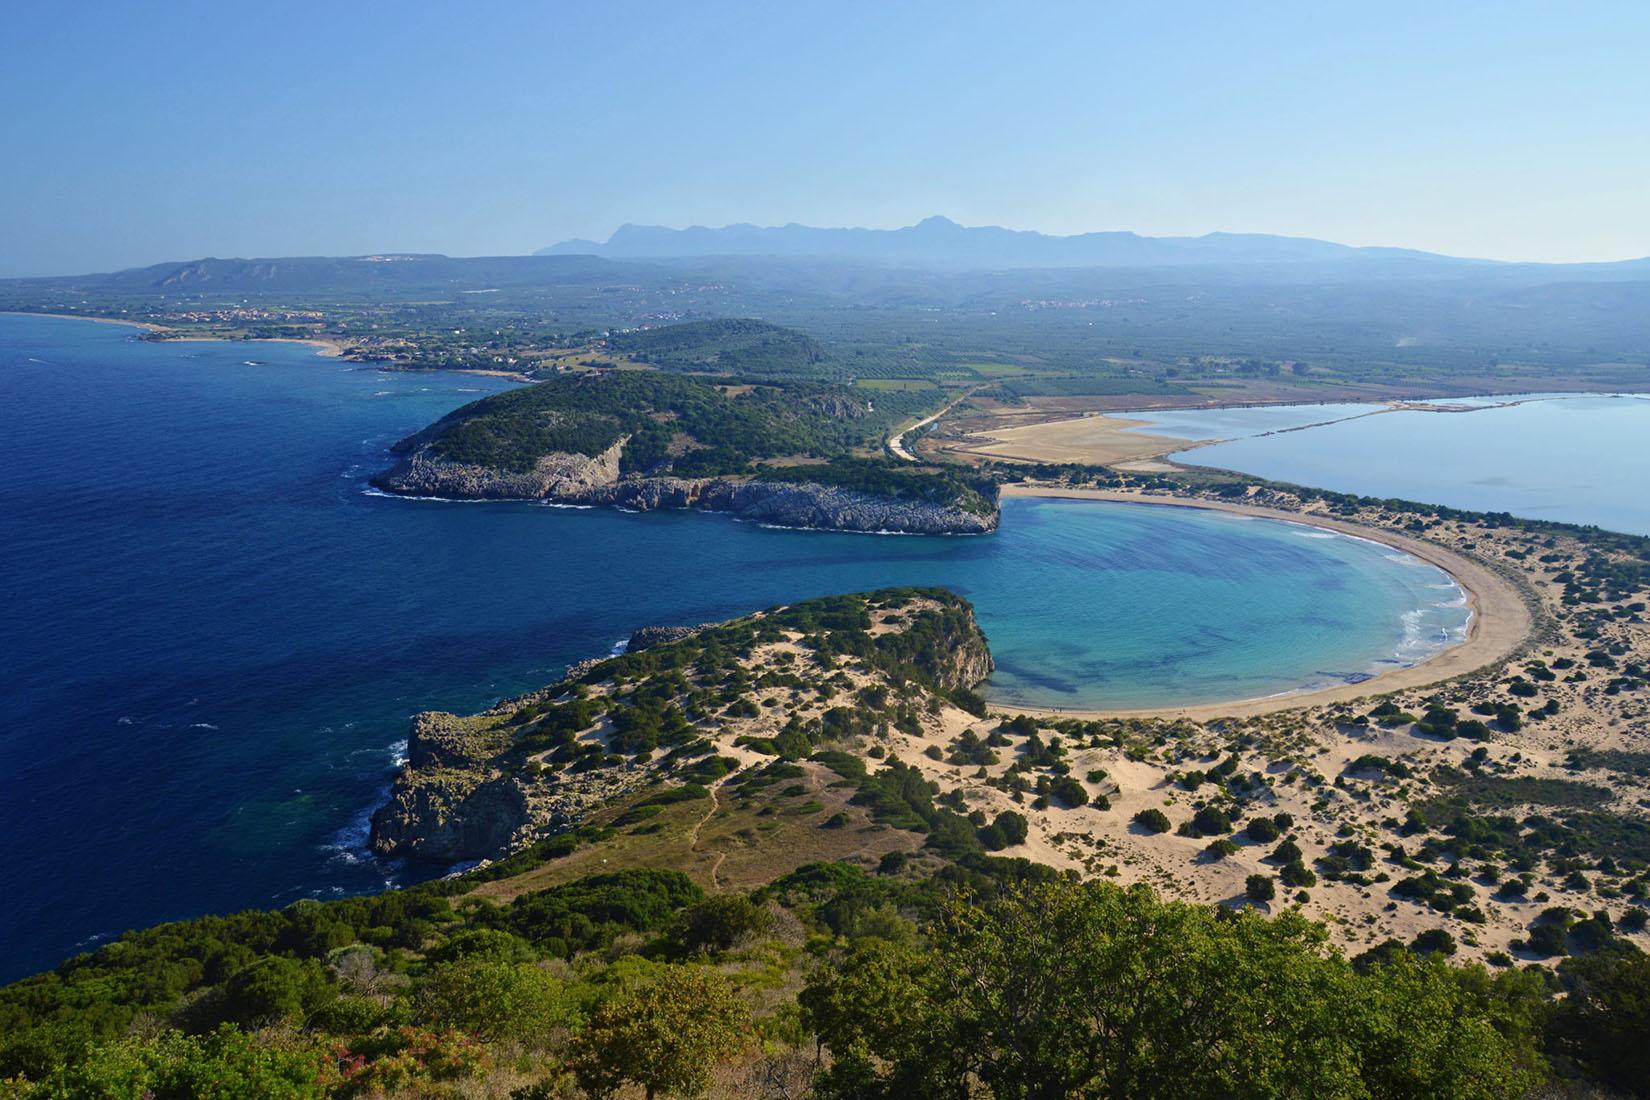 Tsaglis Extra Virgin Olive Oil - Kalamata Messinia - Voidokoilia Beach